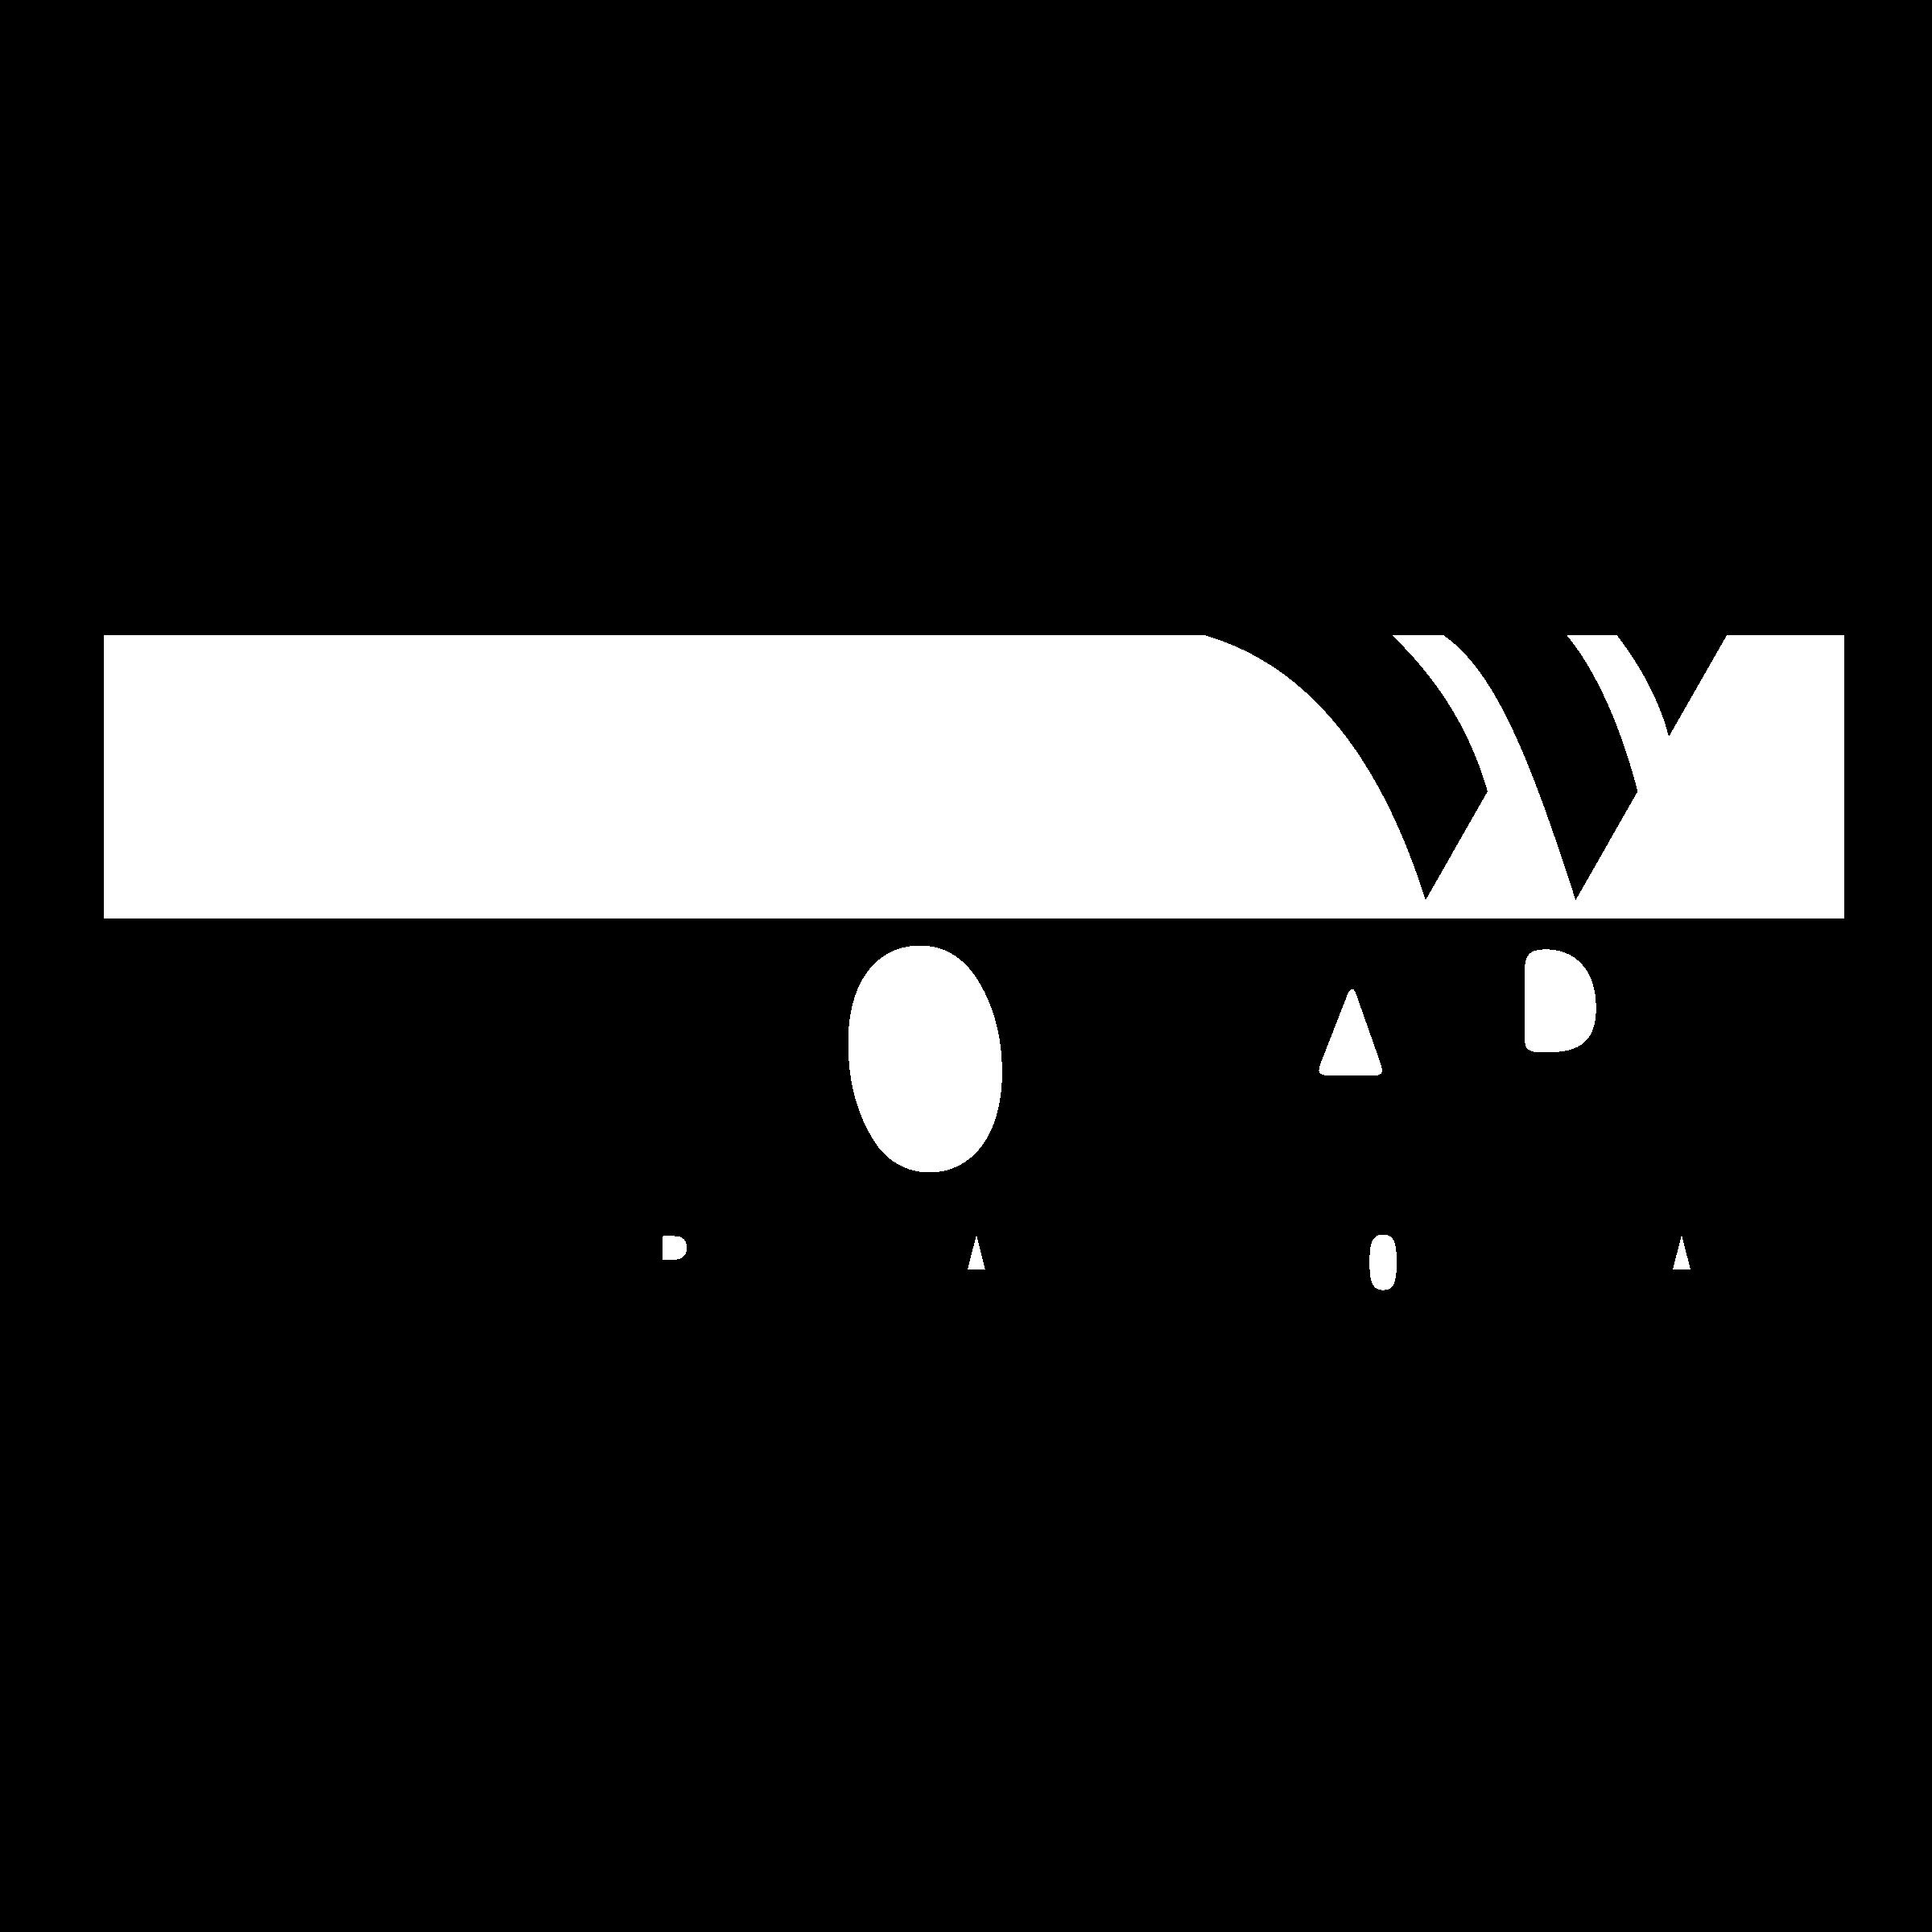 Wilsonart Logo PNG Transparent & SVG Vector - Freebie Supply